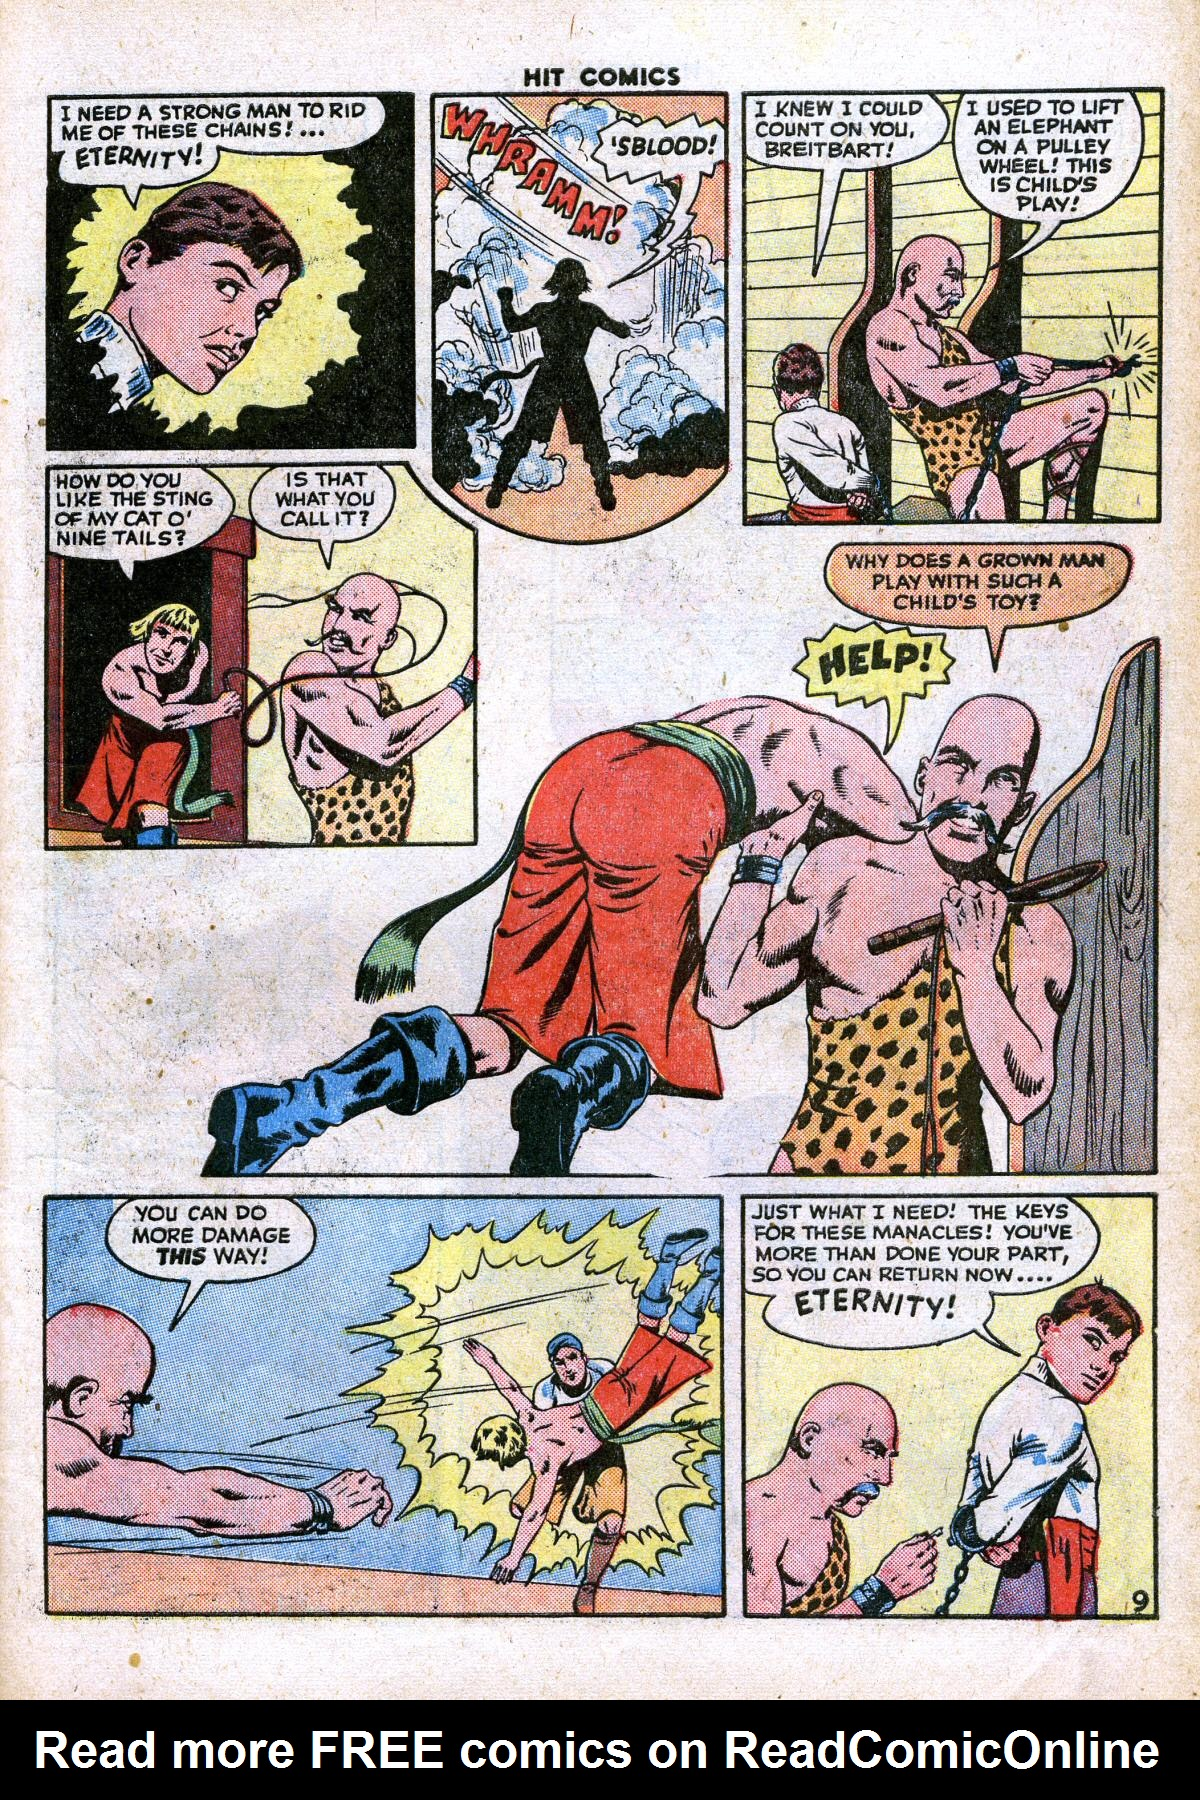 Read online Hit Comics comic -  Issue #41 - 11